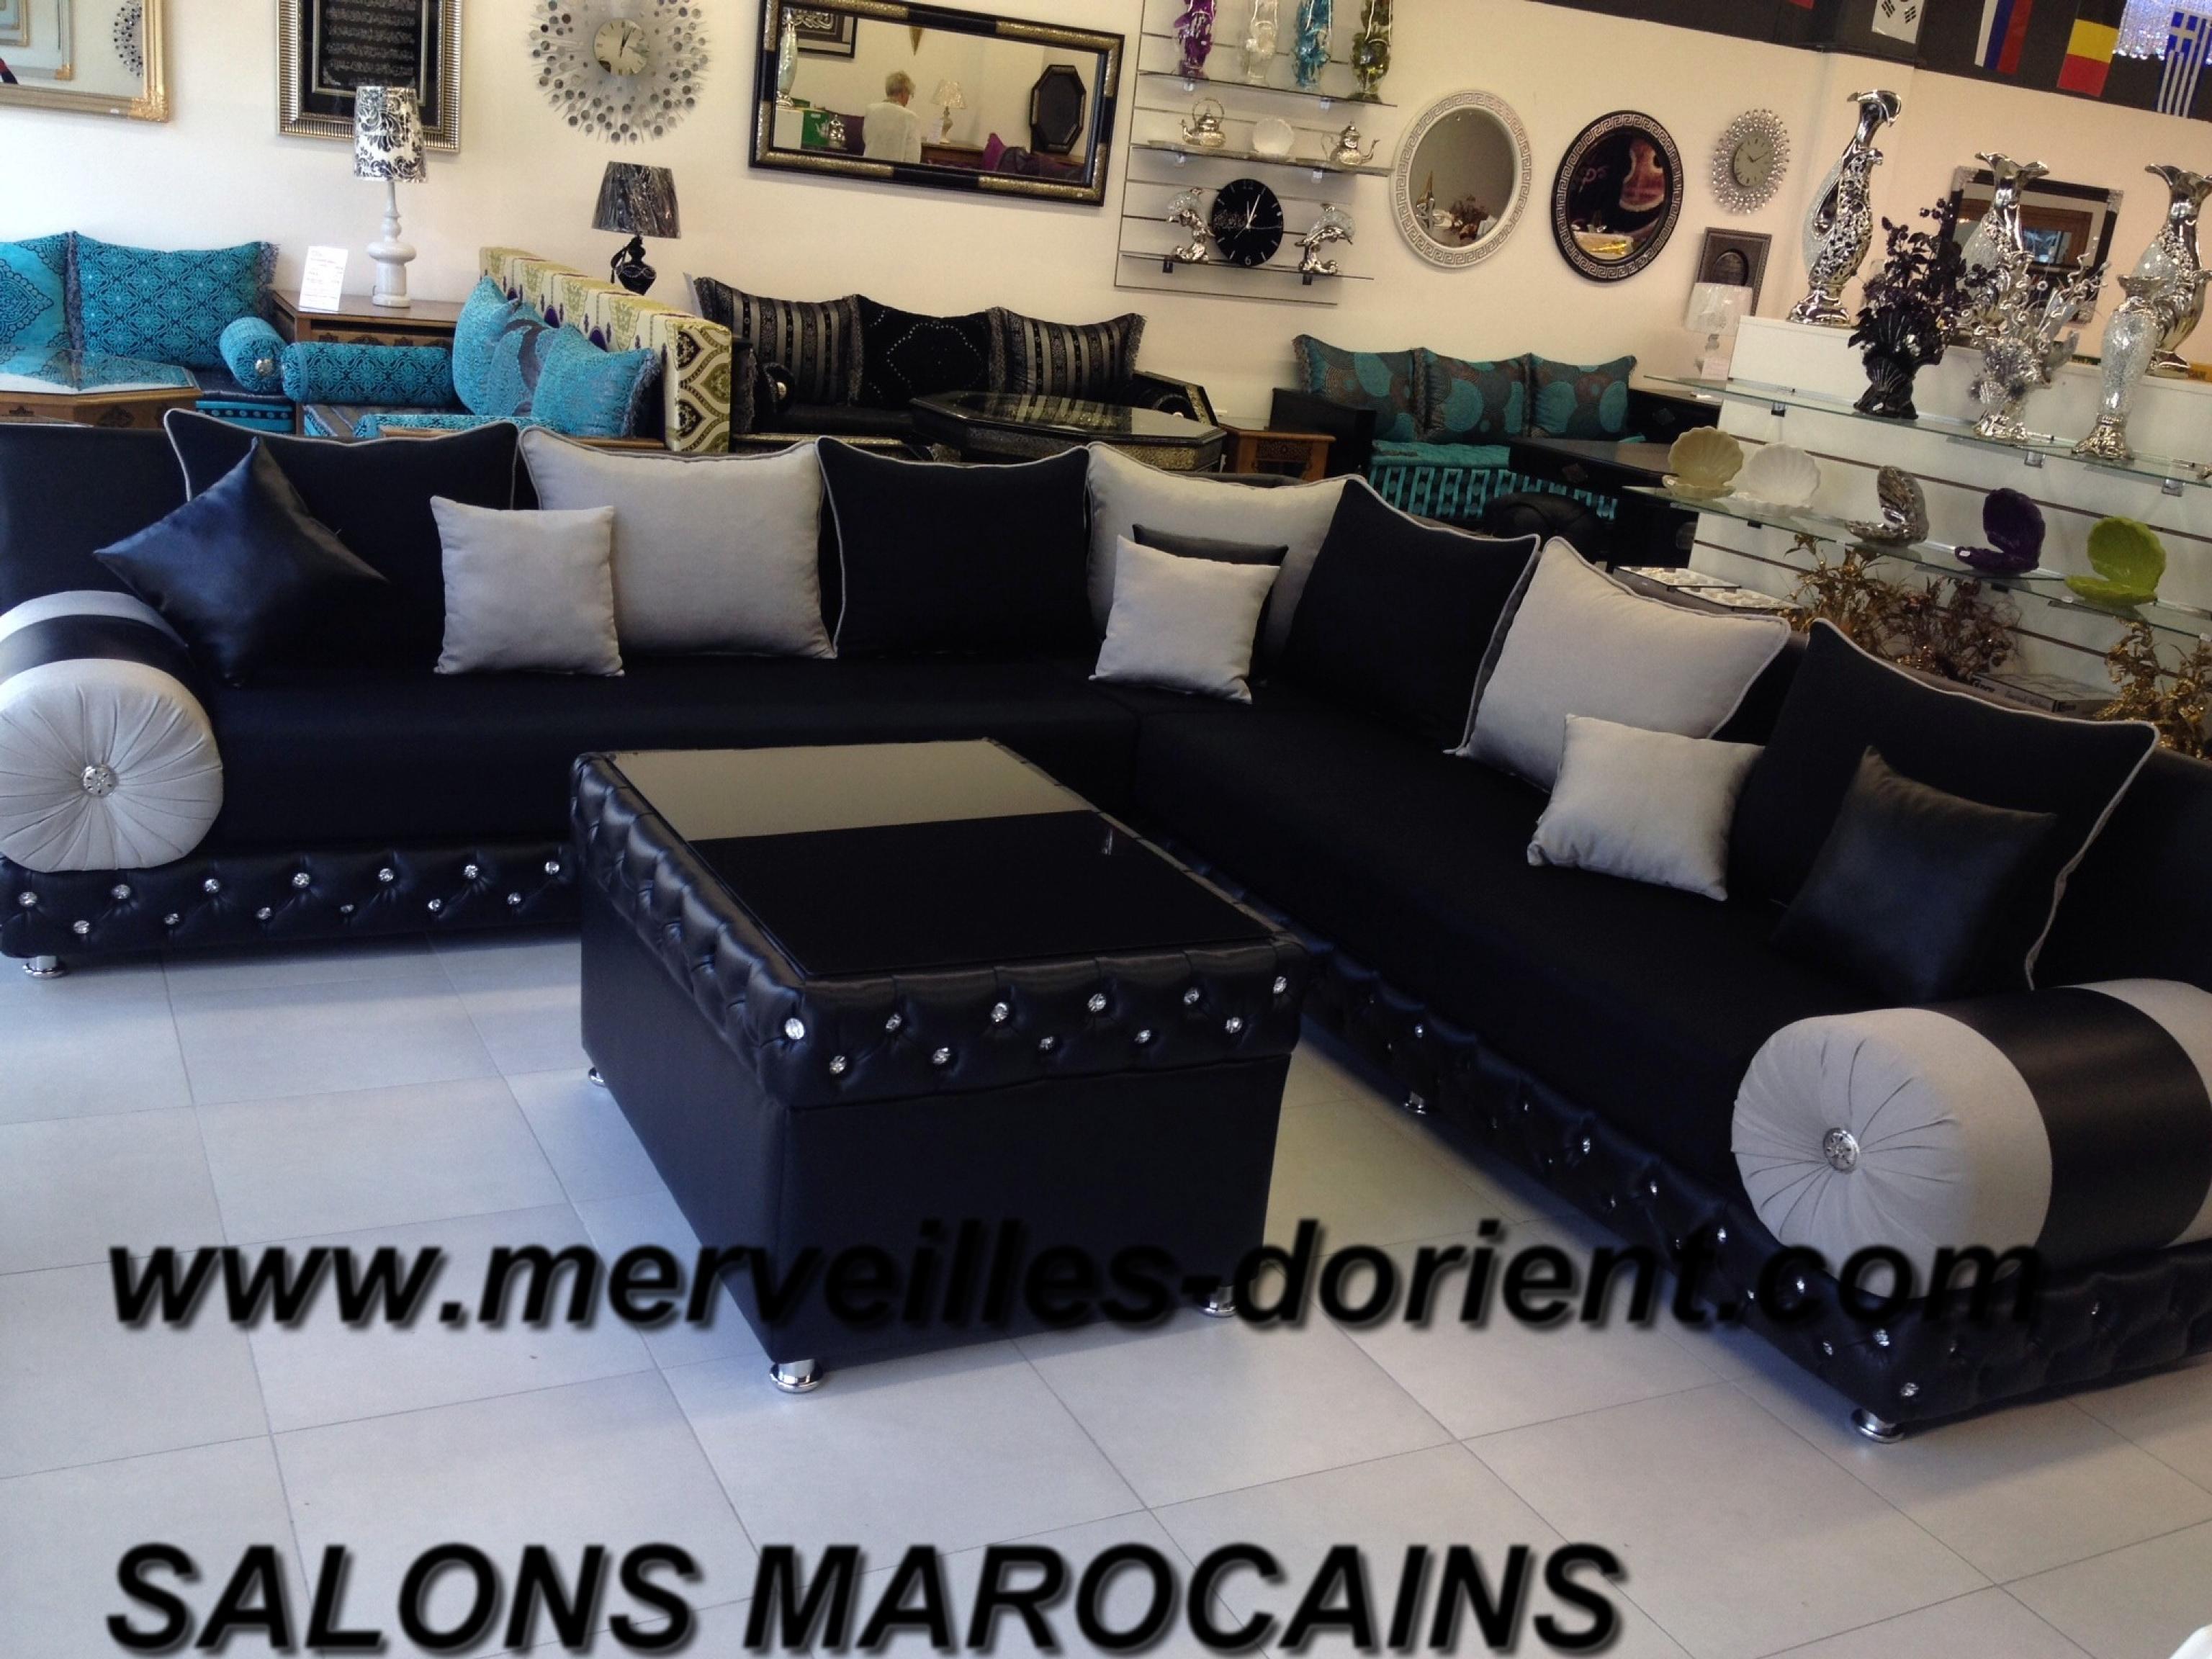 Salon Marocain Noir Avec Strass : Awesome salon marocain noir avec strass photos